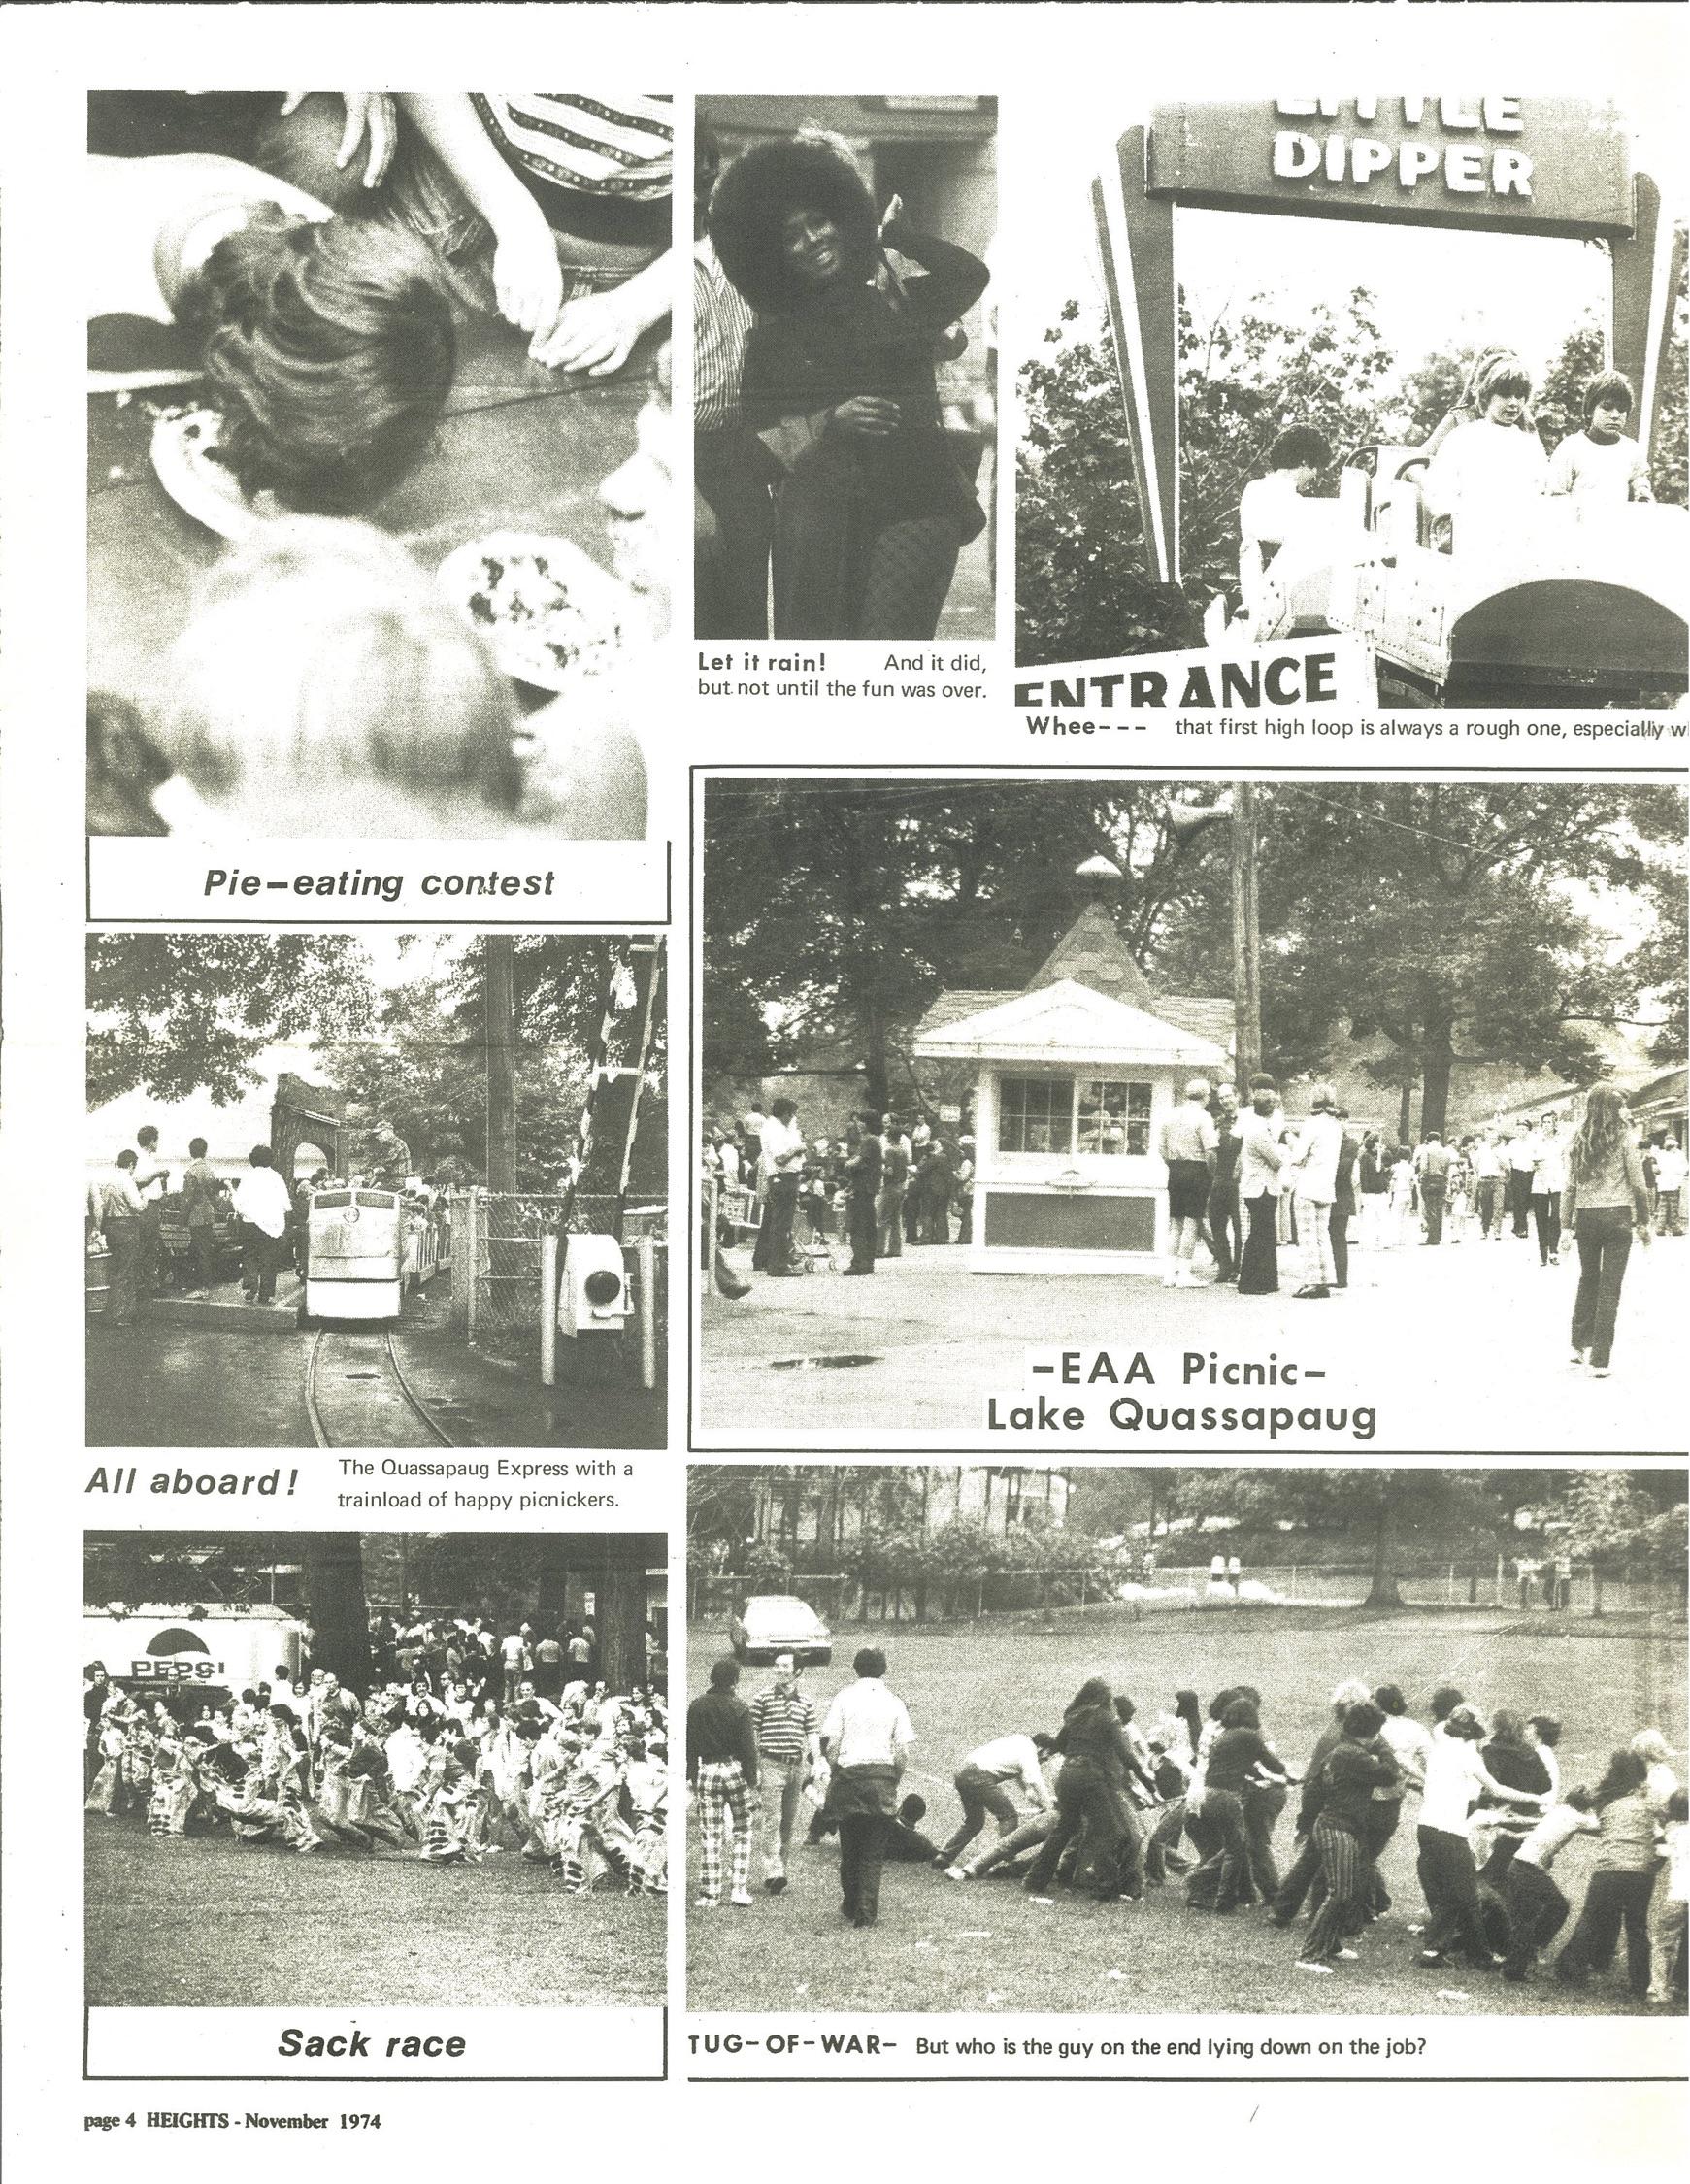 vol 7 num 4 page 4.jpg